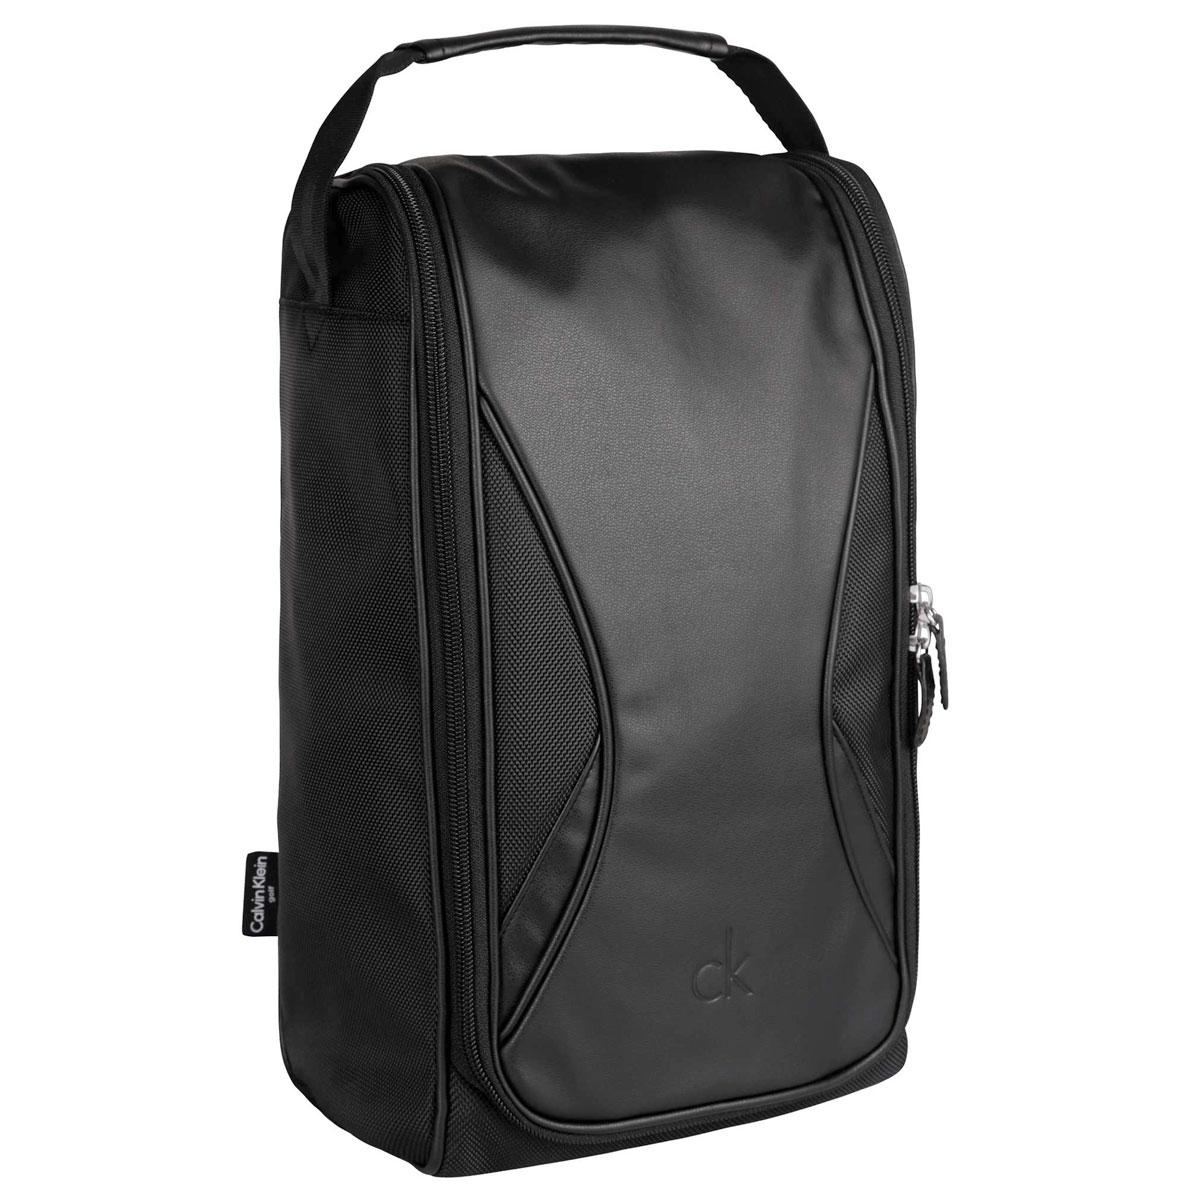 065713ac42 Calvin Klein Unisex 2019 CK Shoe Bag - Black - OS 5397157467684